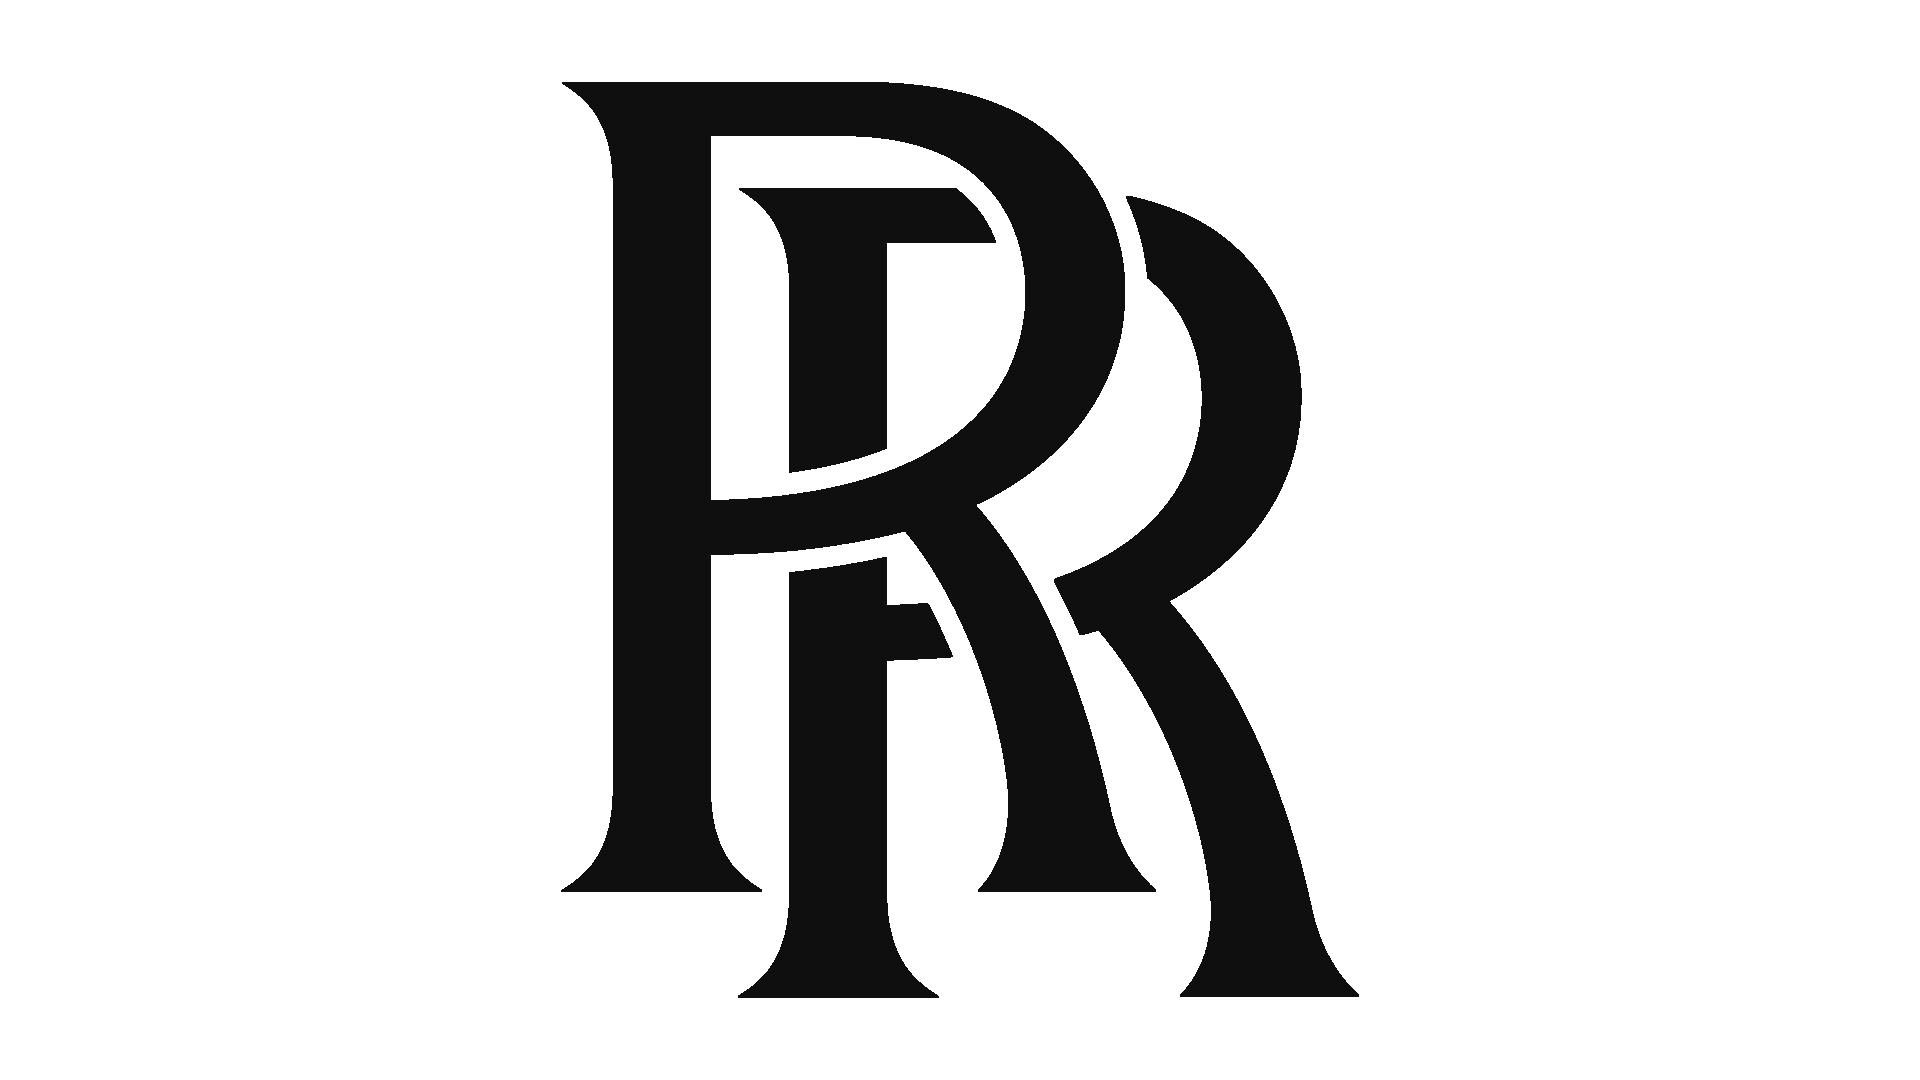 Rolls Royce Rr Logo Rolls Royce Logo Rr Logo Love Background Images